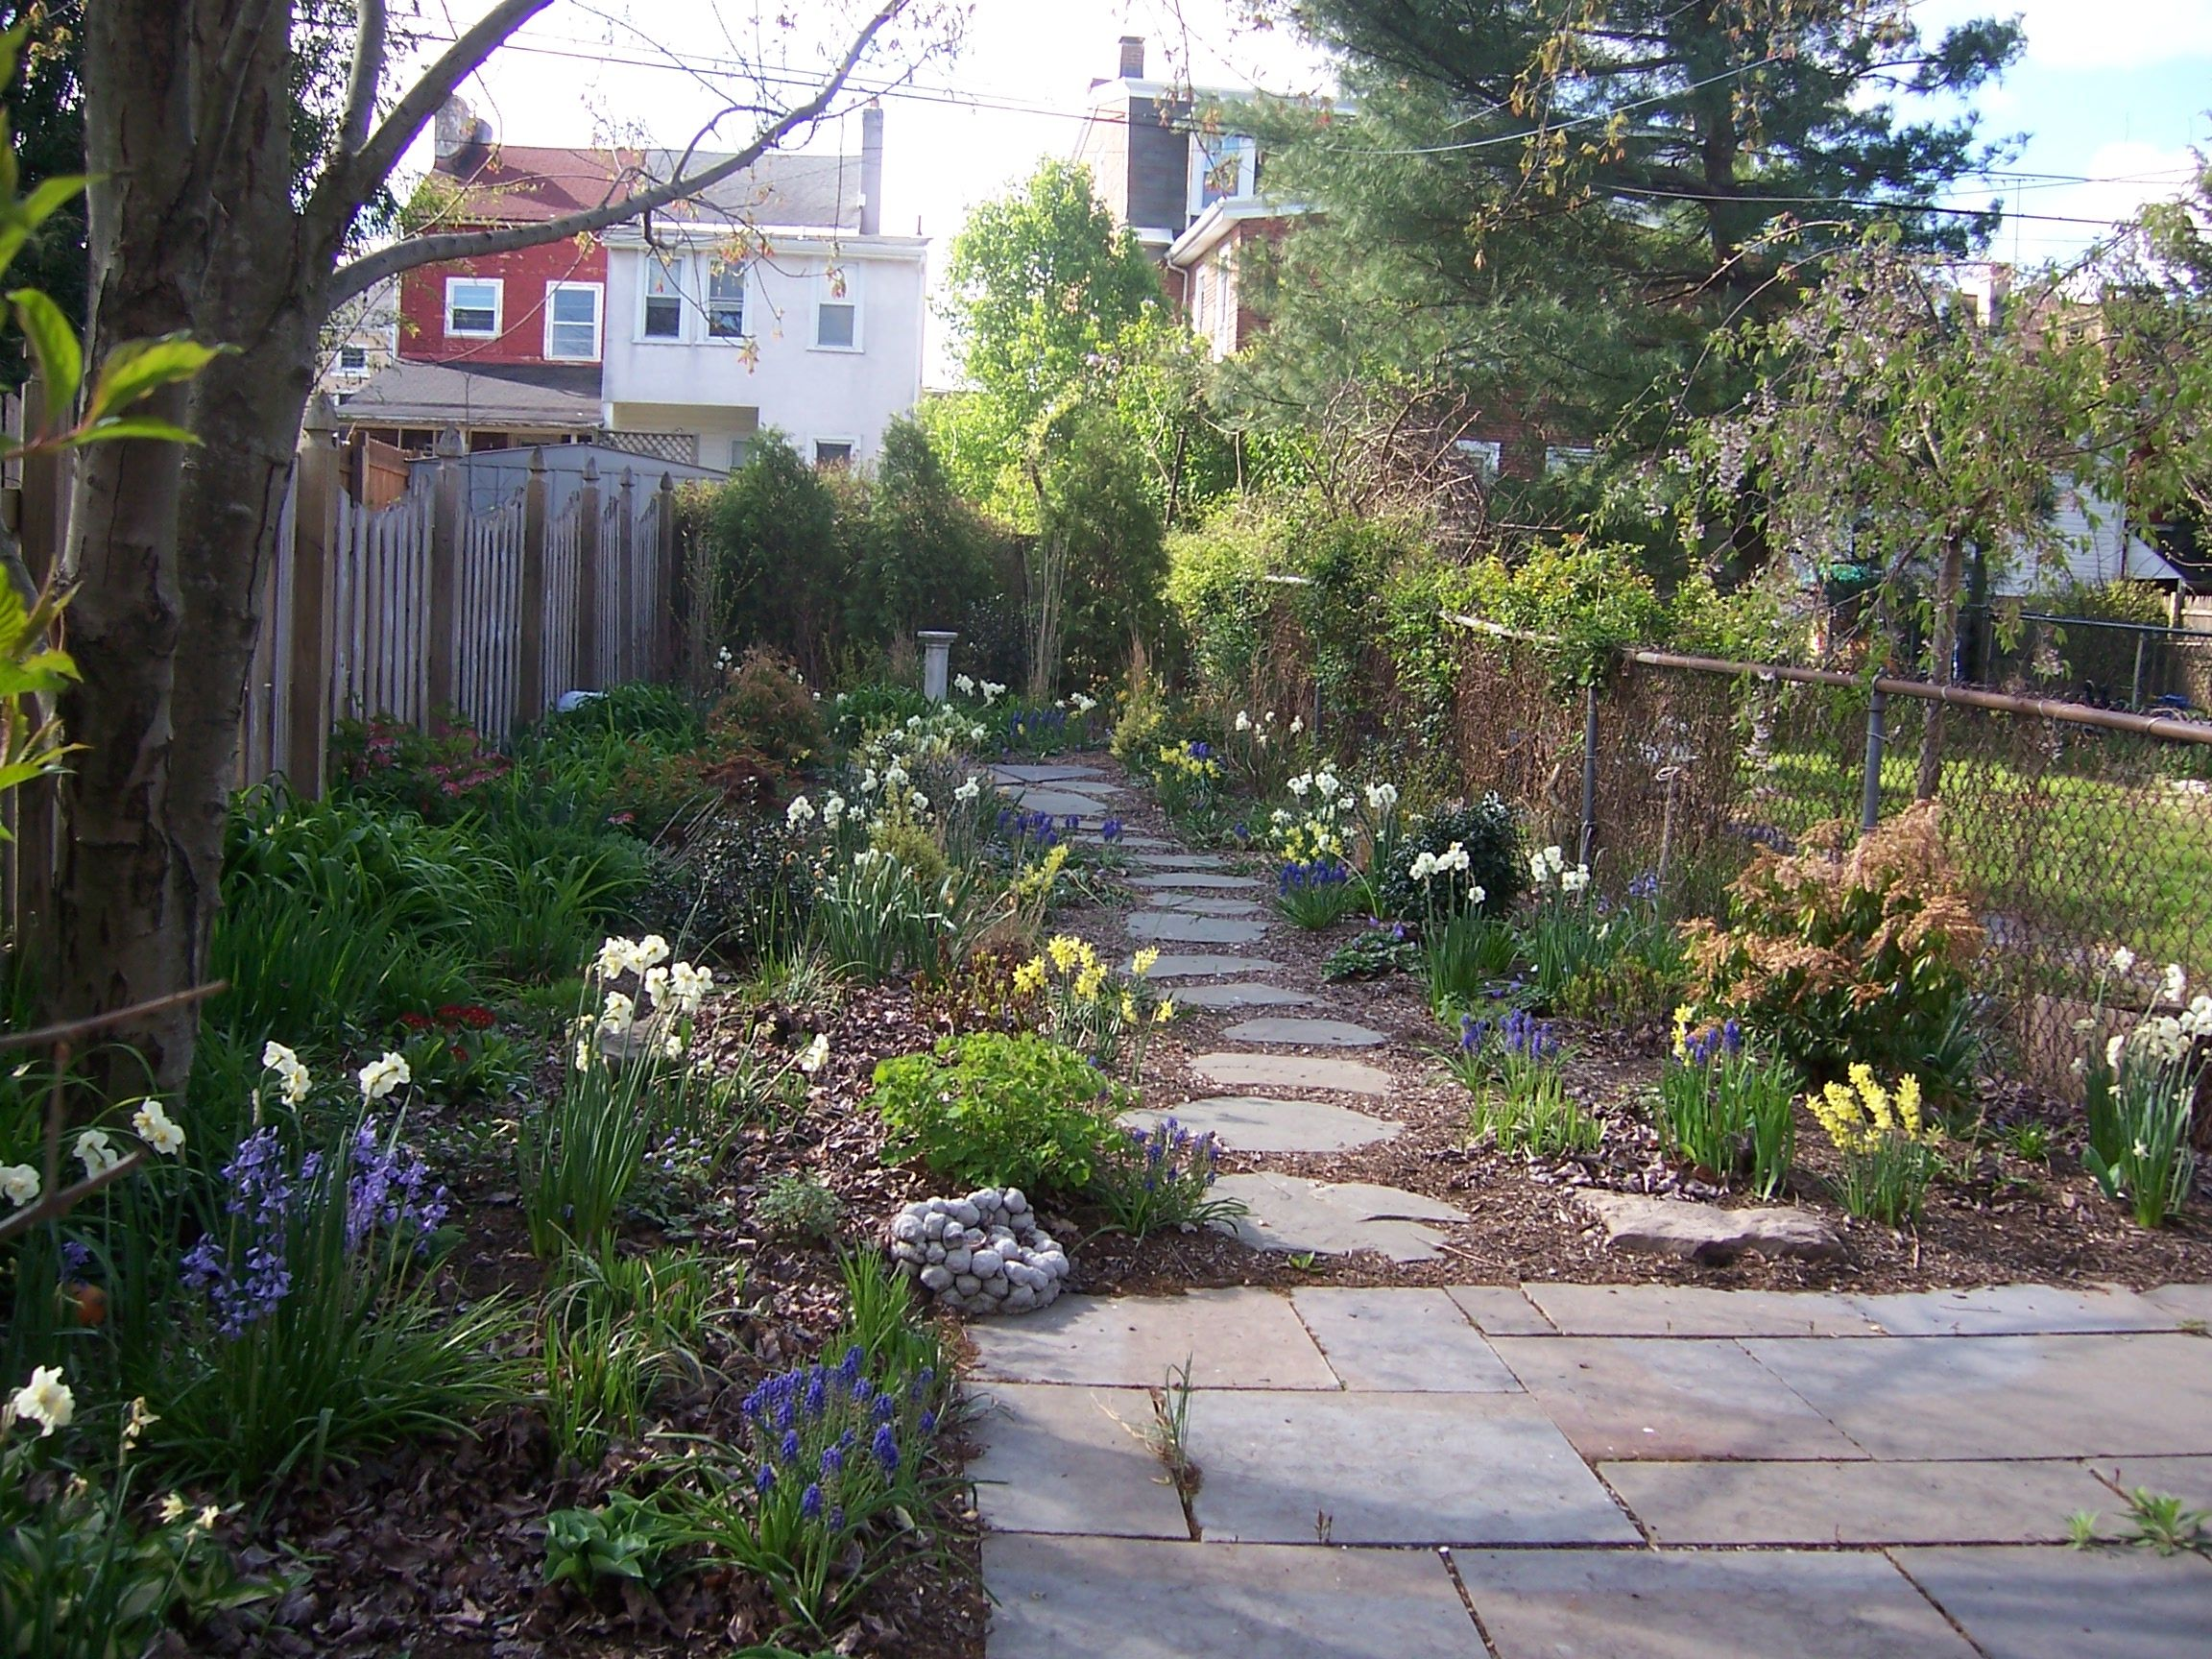 Easy Backyard Landscaping Ideas no Grass | Large backyard ... on No Lawn Garden Ideas  id=45725